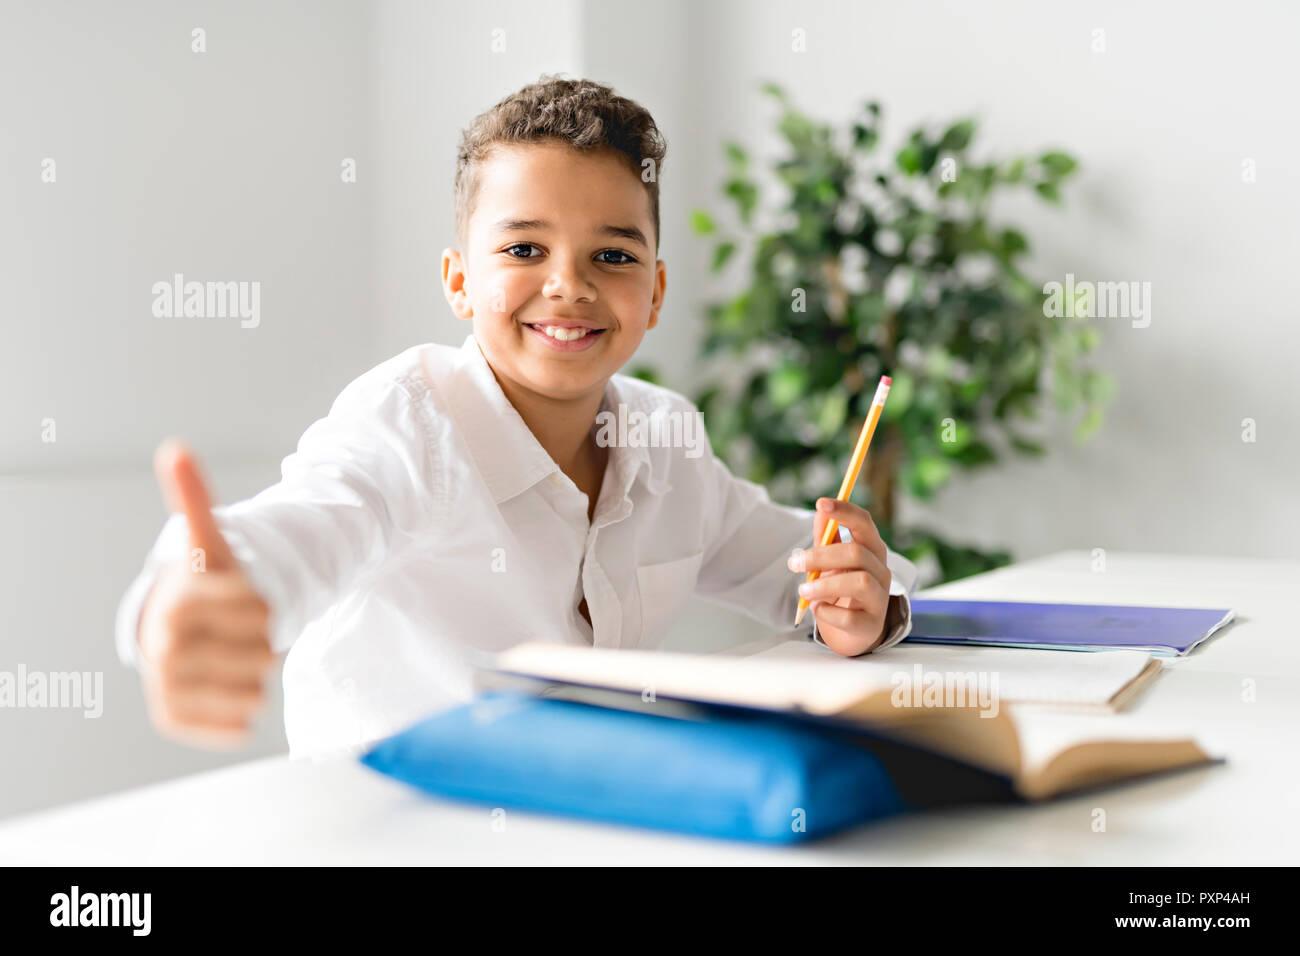 a cute black boy doing homework at home stock photo 222991849 alamy rh alamy com Not Doing Homework Family Doing Homework